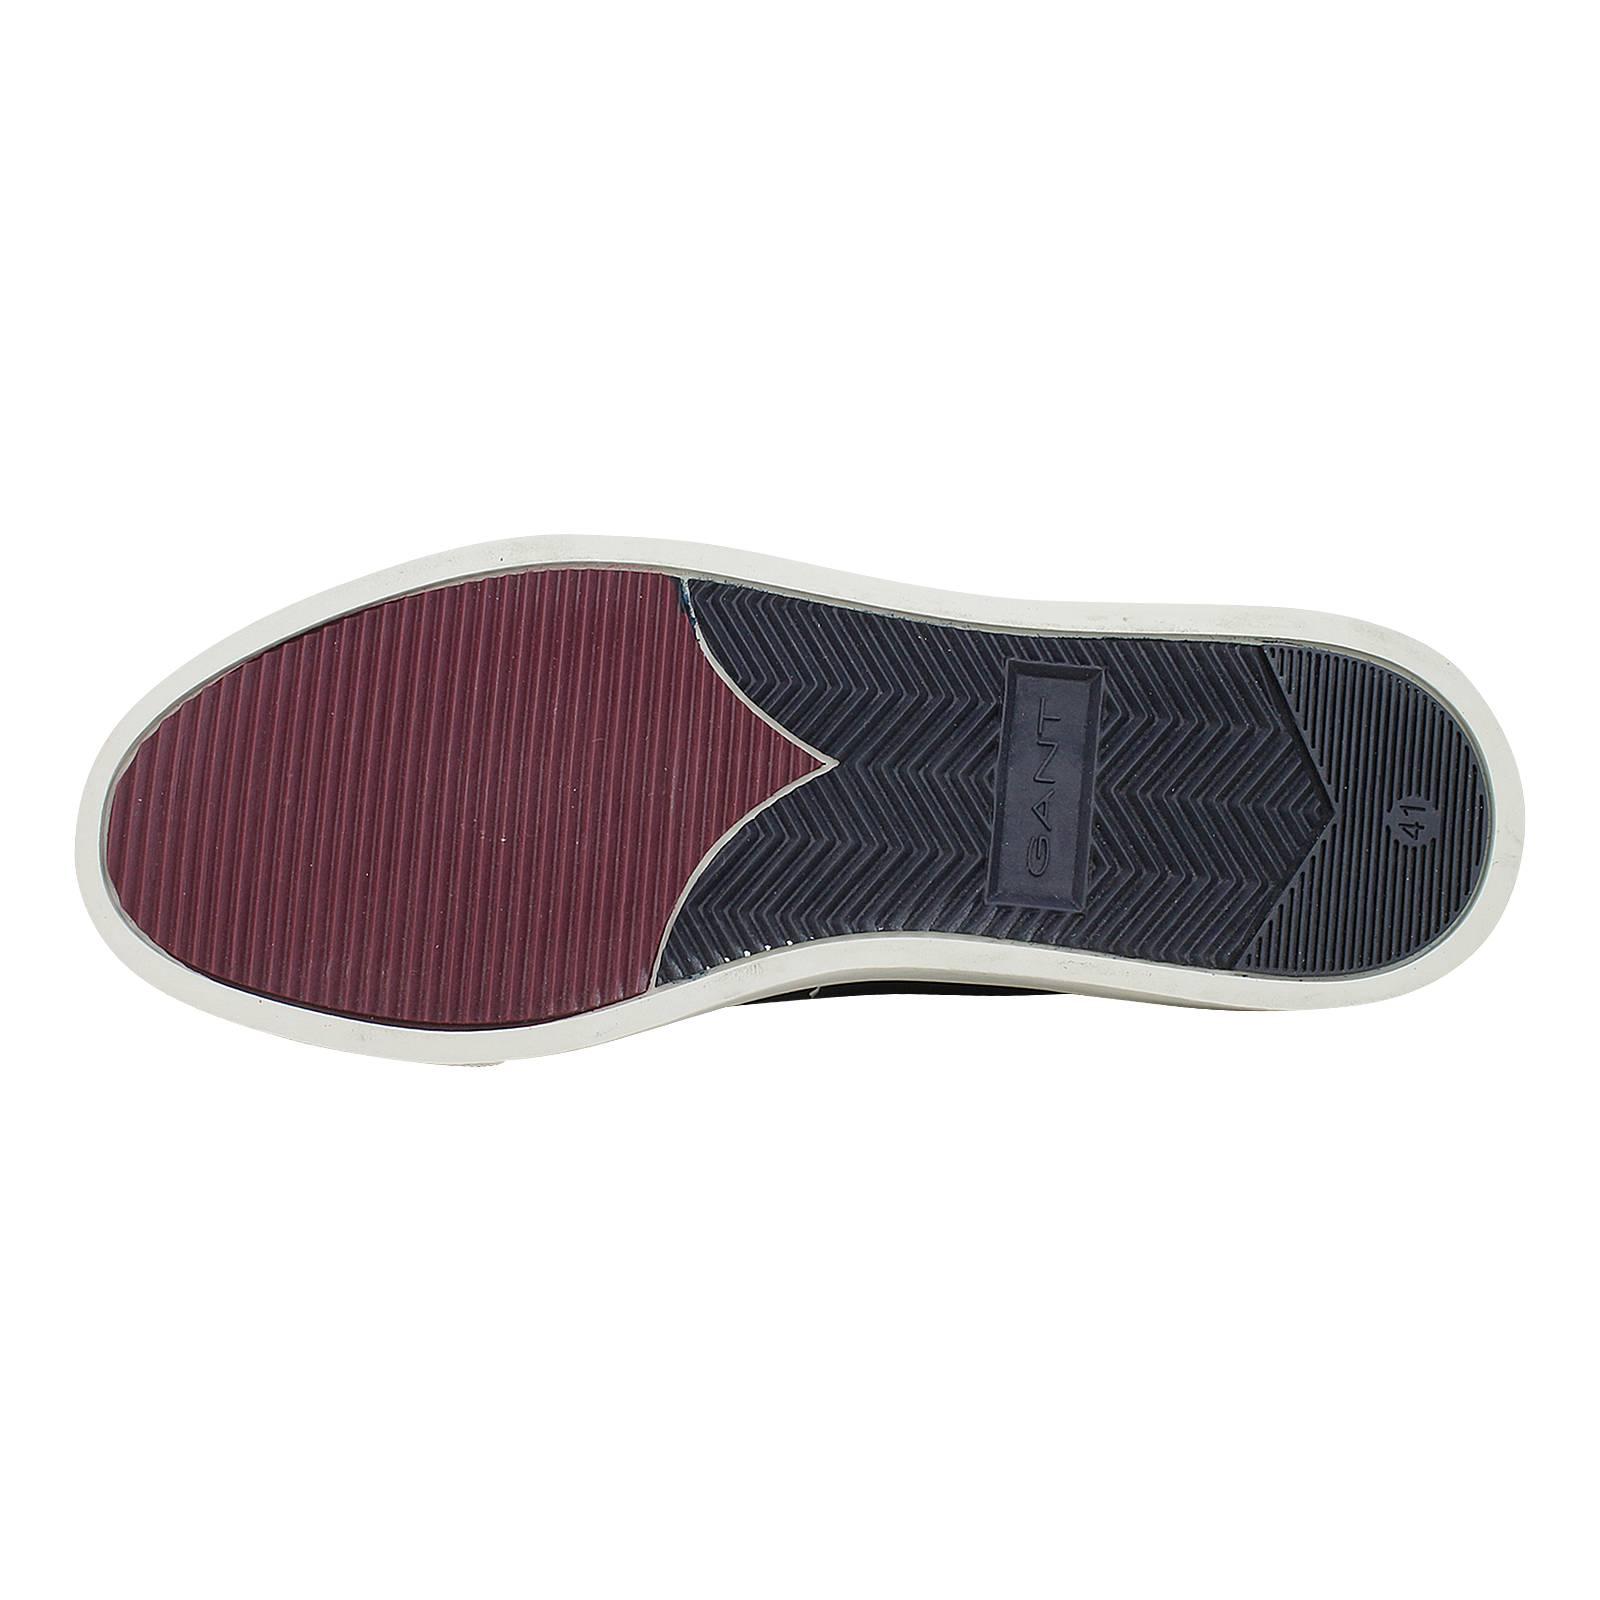 a1cc3717f51a Major - Ανδρικά παπούτσια casual Gant από δερμα